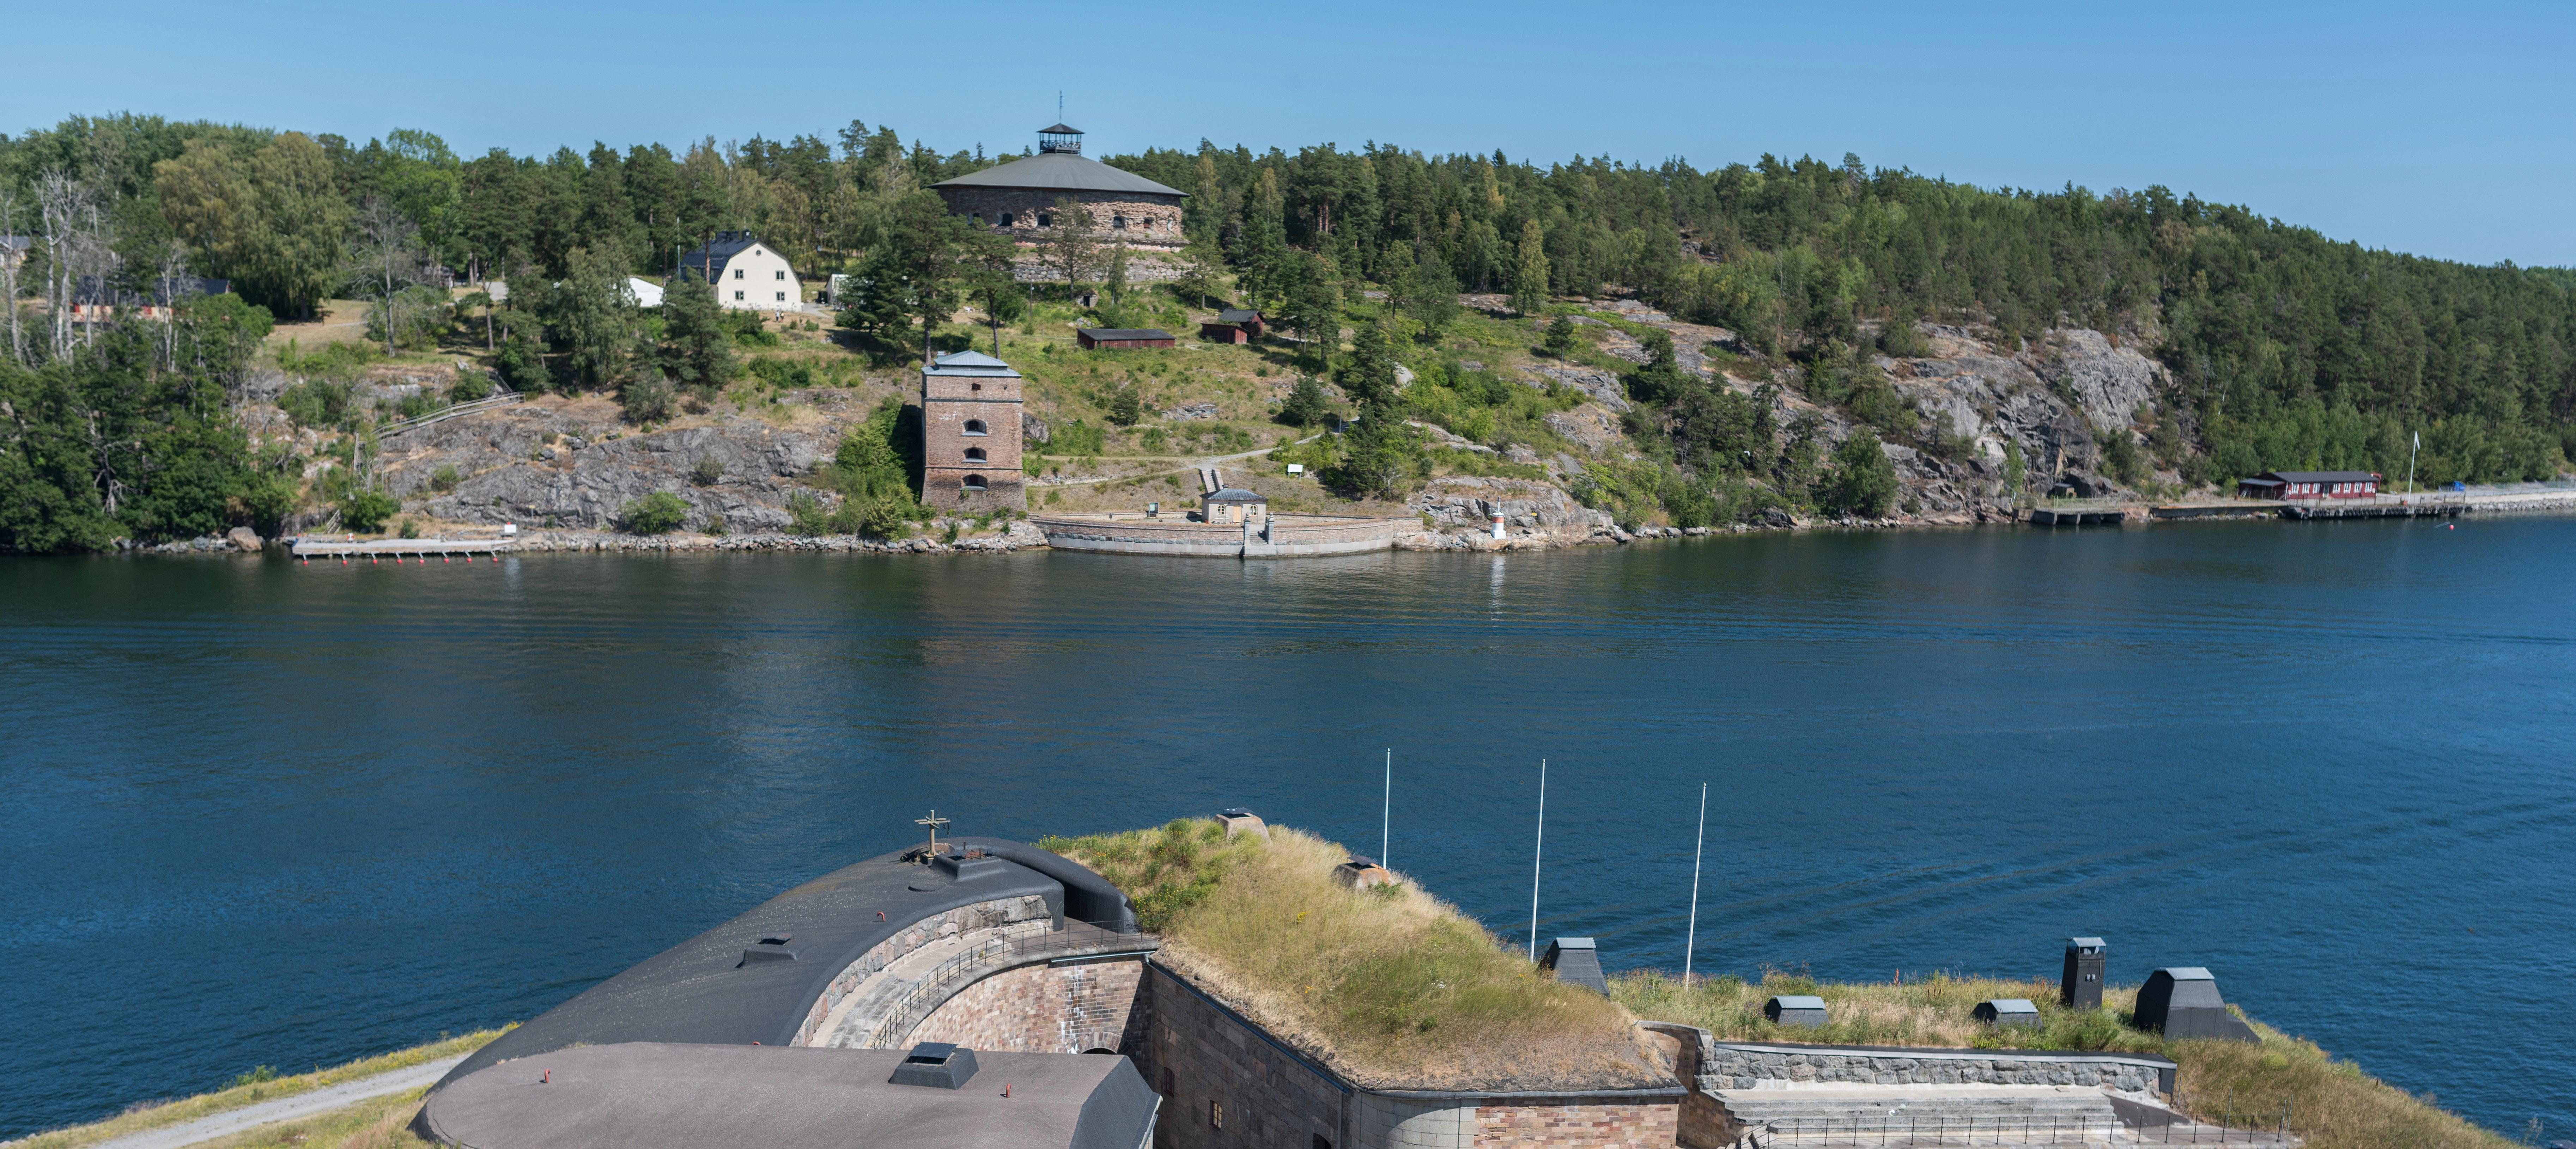 Havsutsikt p Rind - Cabins for Rent in Vaxholm, Stockholms